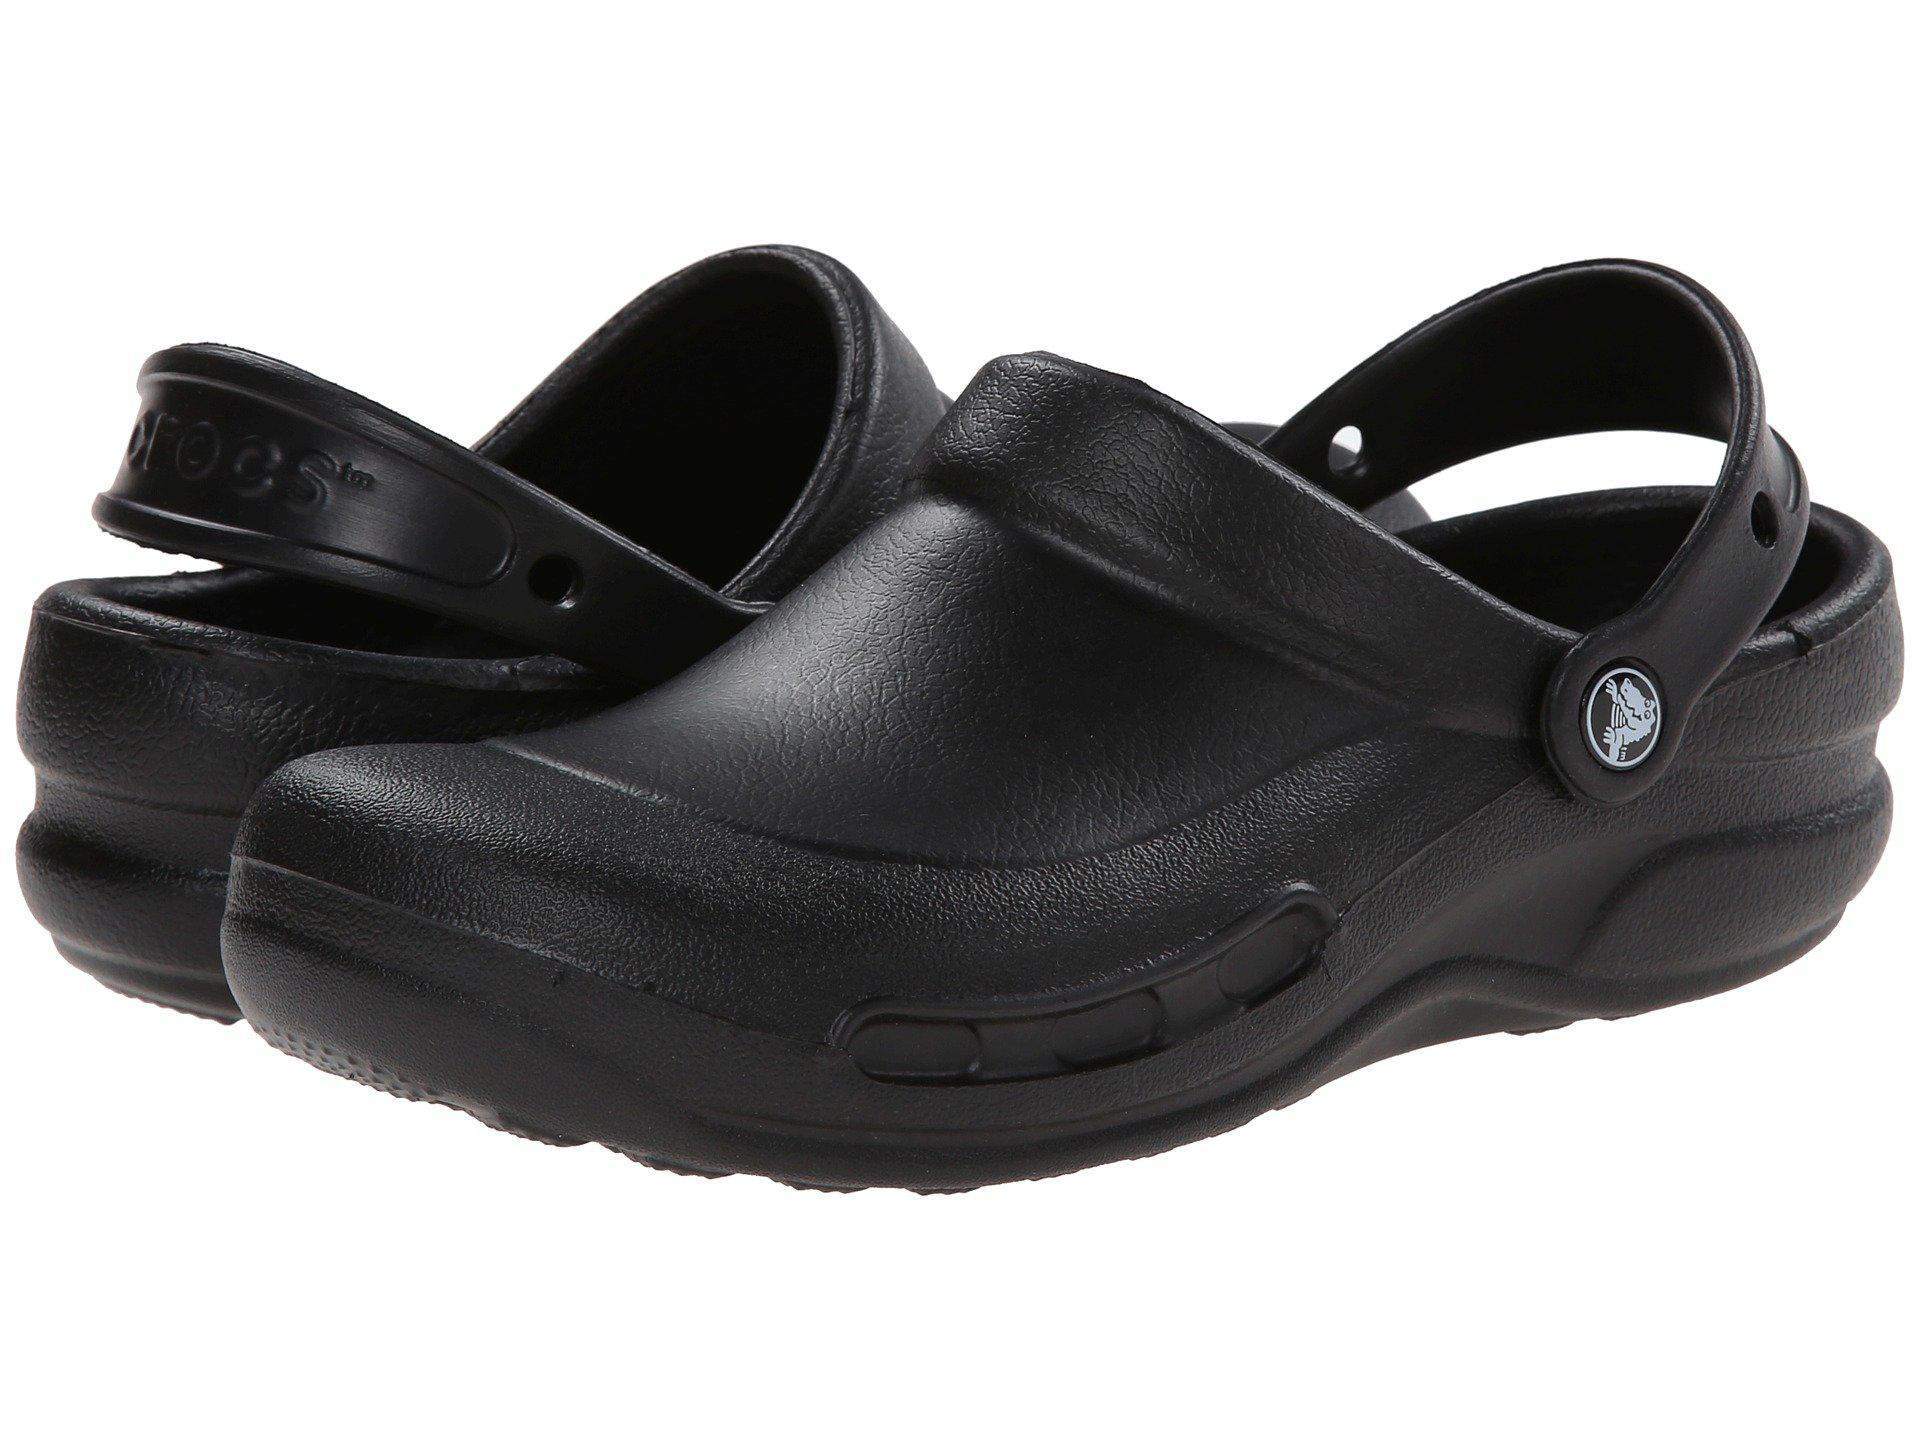 Crocs Specialist Enclosed (Unisex) fGZ4wa